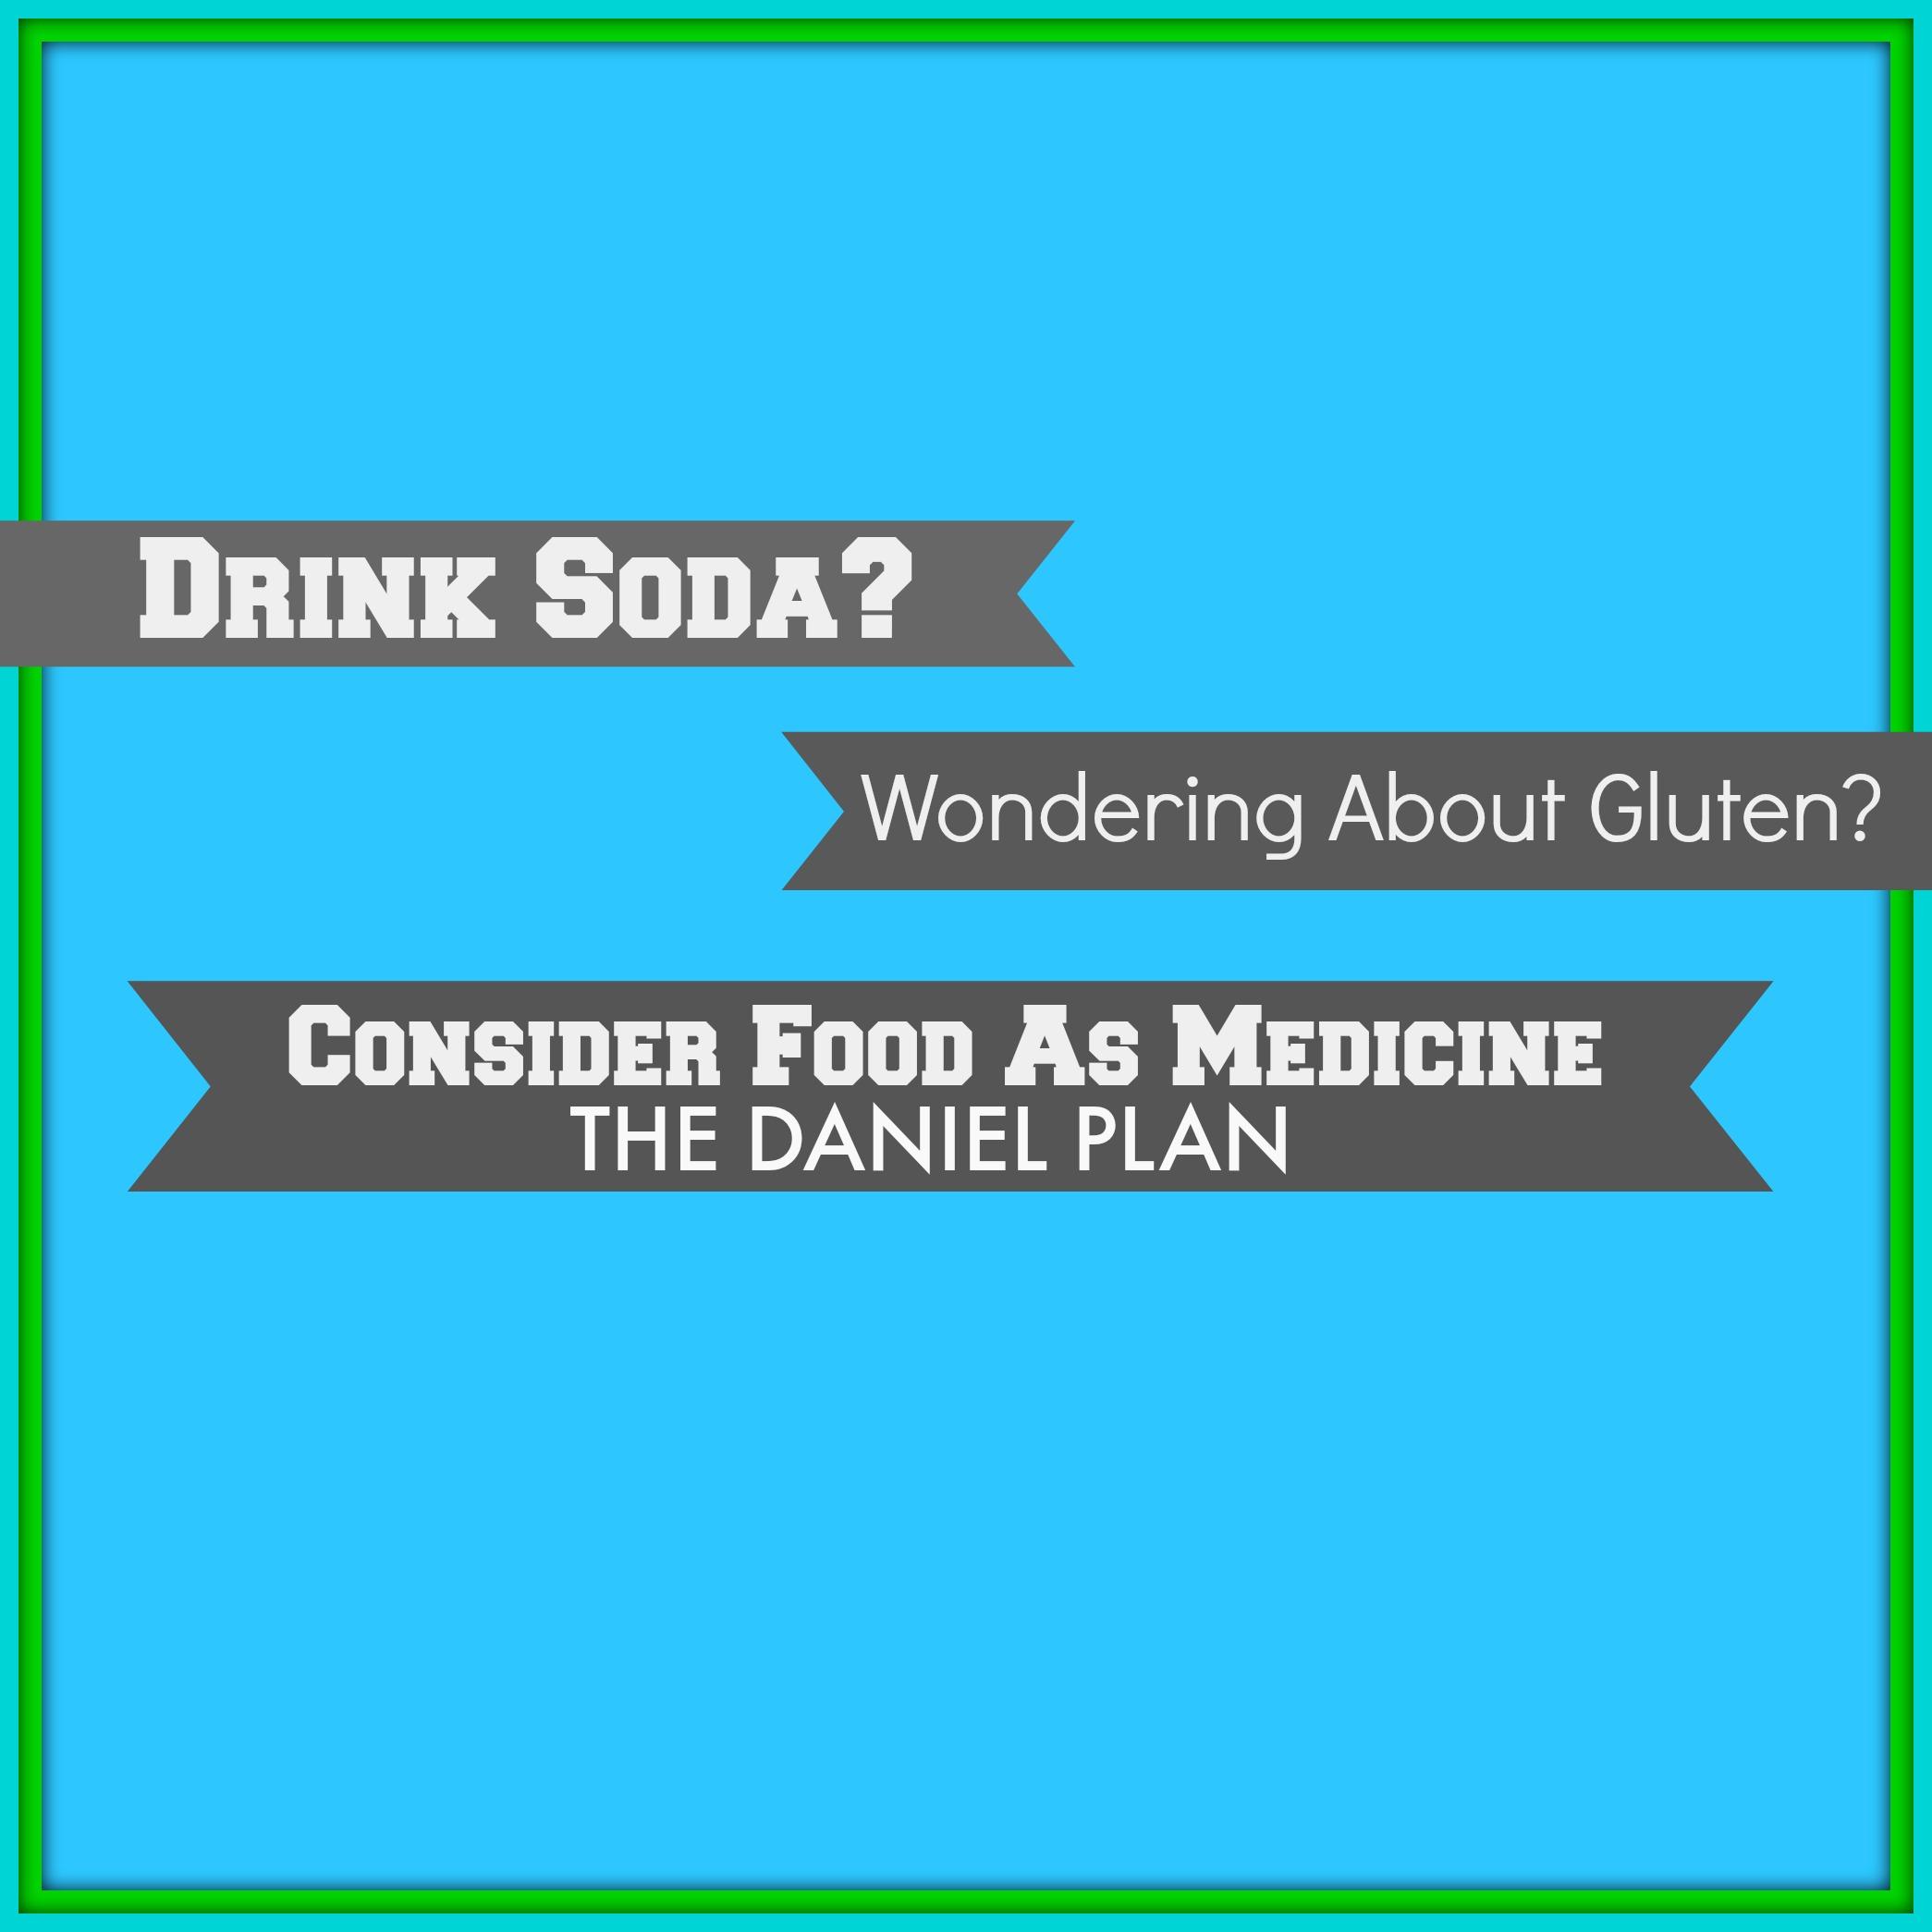 Drink Soda Wondering About Gluten Consider Food As Medicine! (The Daniel Plan).jpg